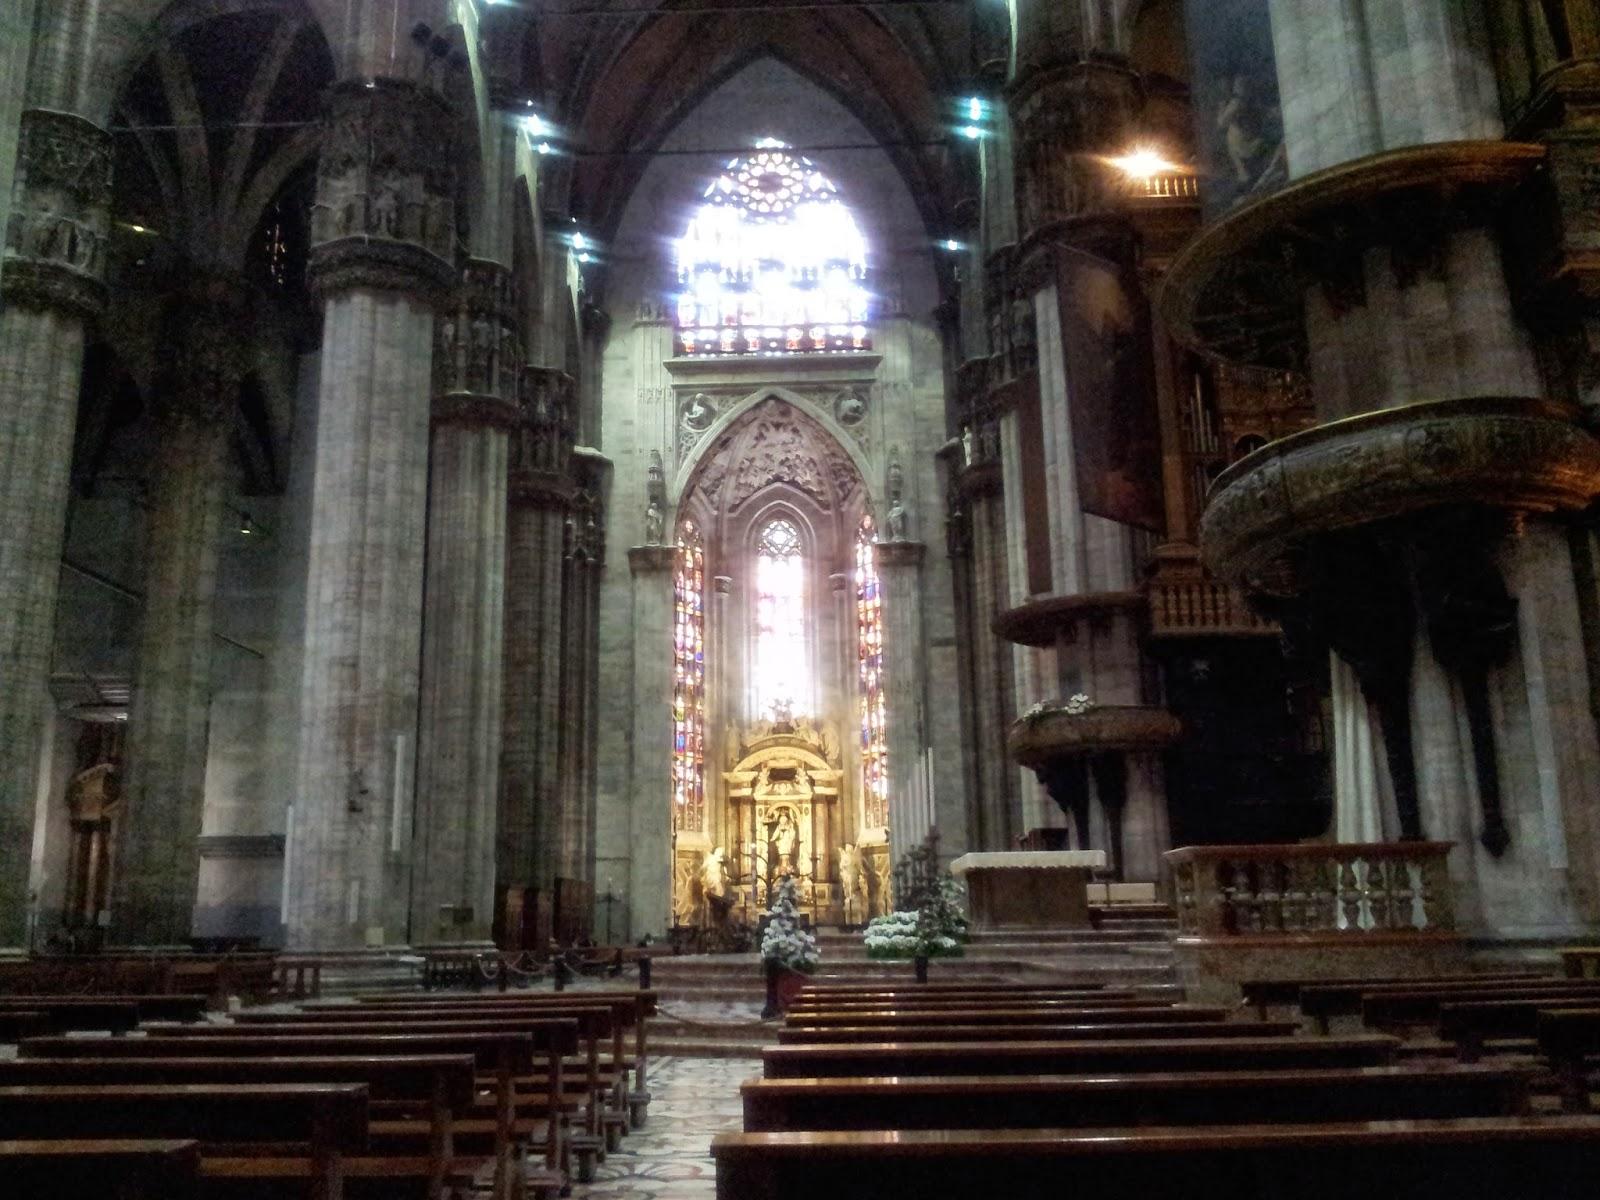 the alter inside the Duomo, Milan